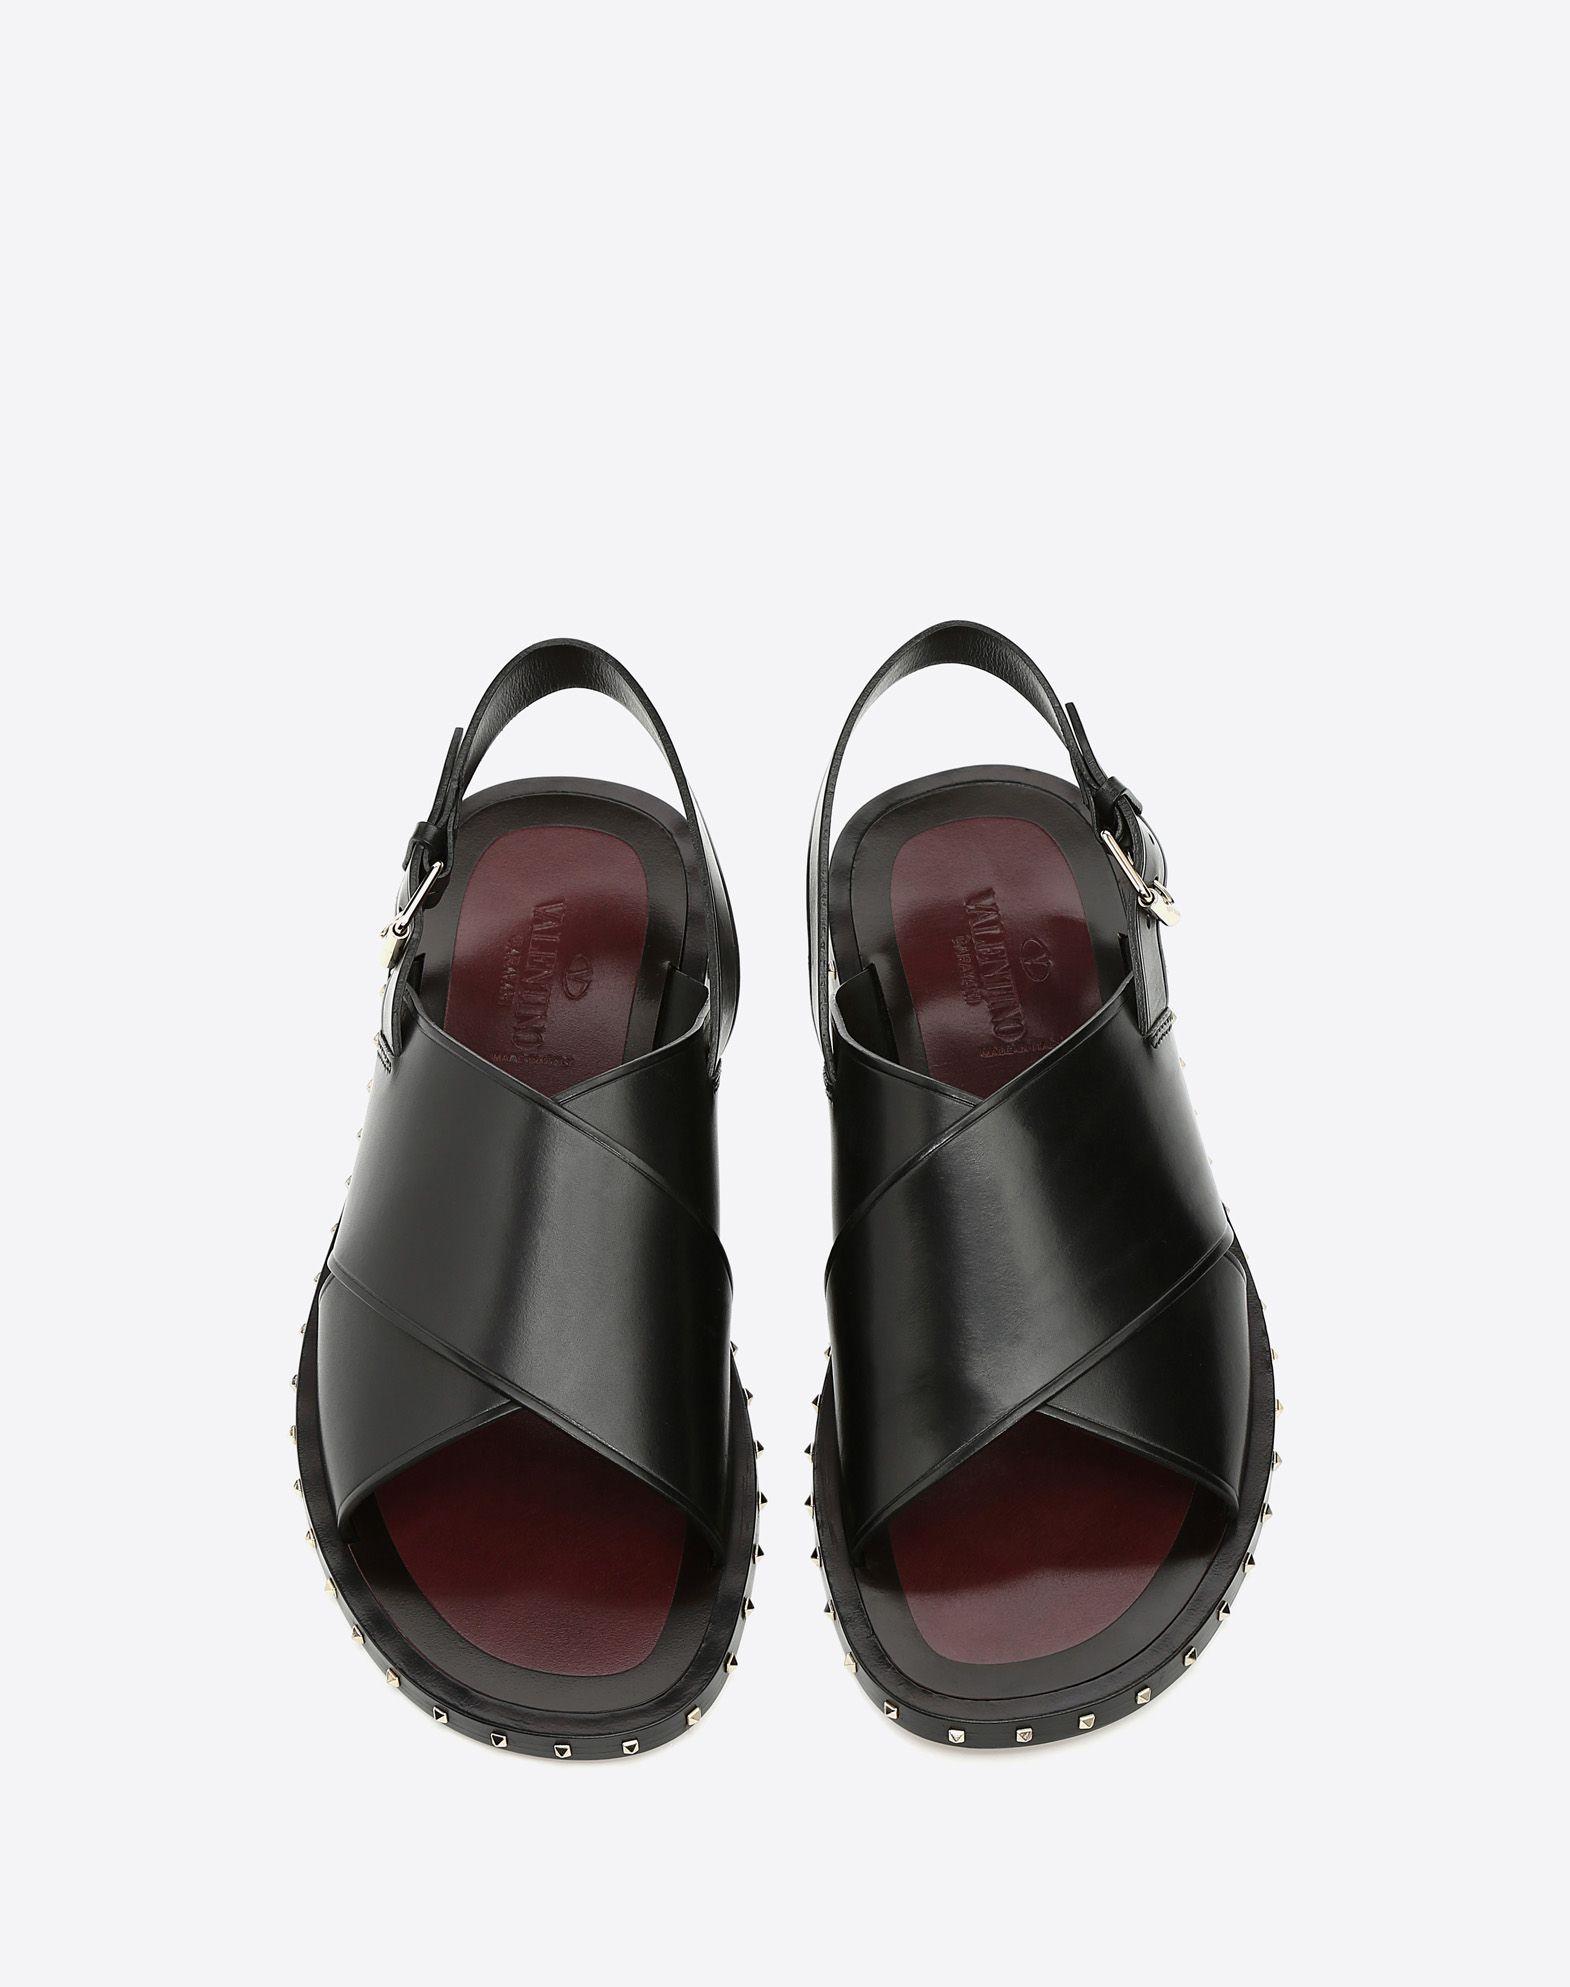 VALENTINO GARAVANI UOMO Soul Rockstud 凉鞋 凉鞋 U e